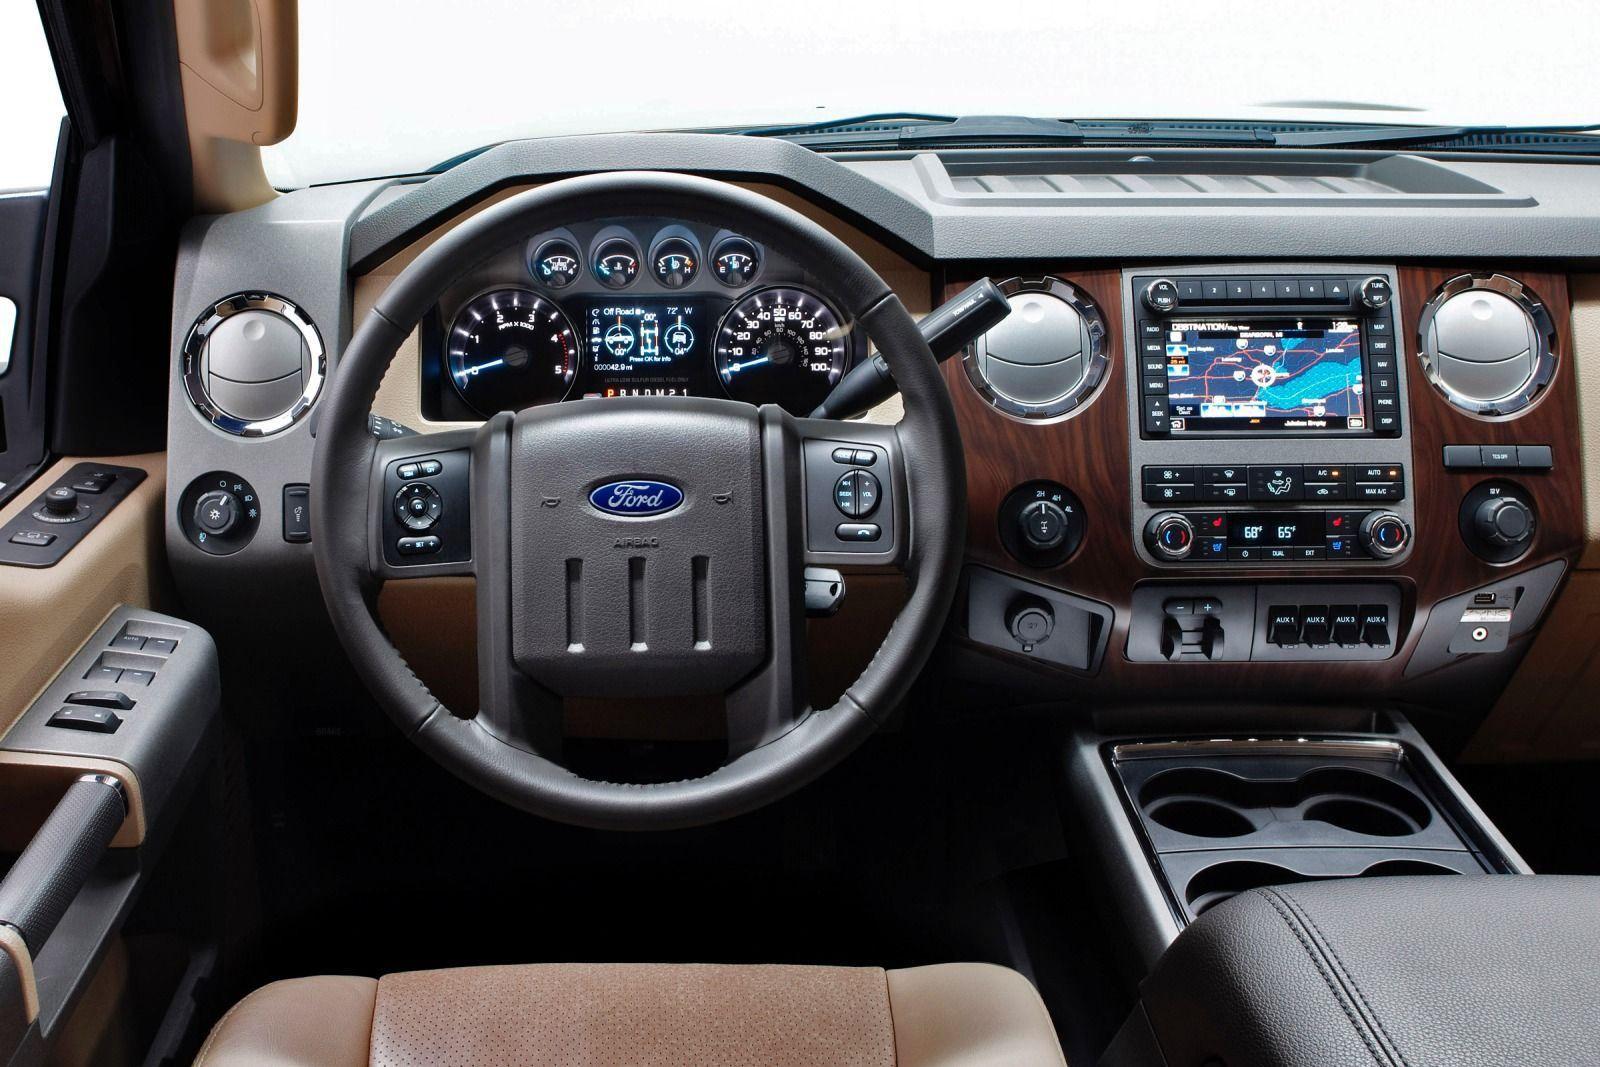 2015 ford f250 diesel redesign http www ligcars xyz